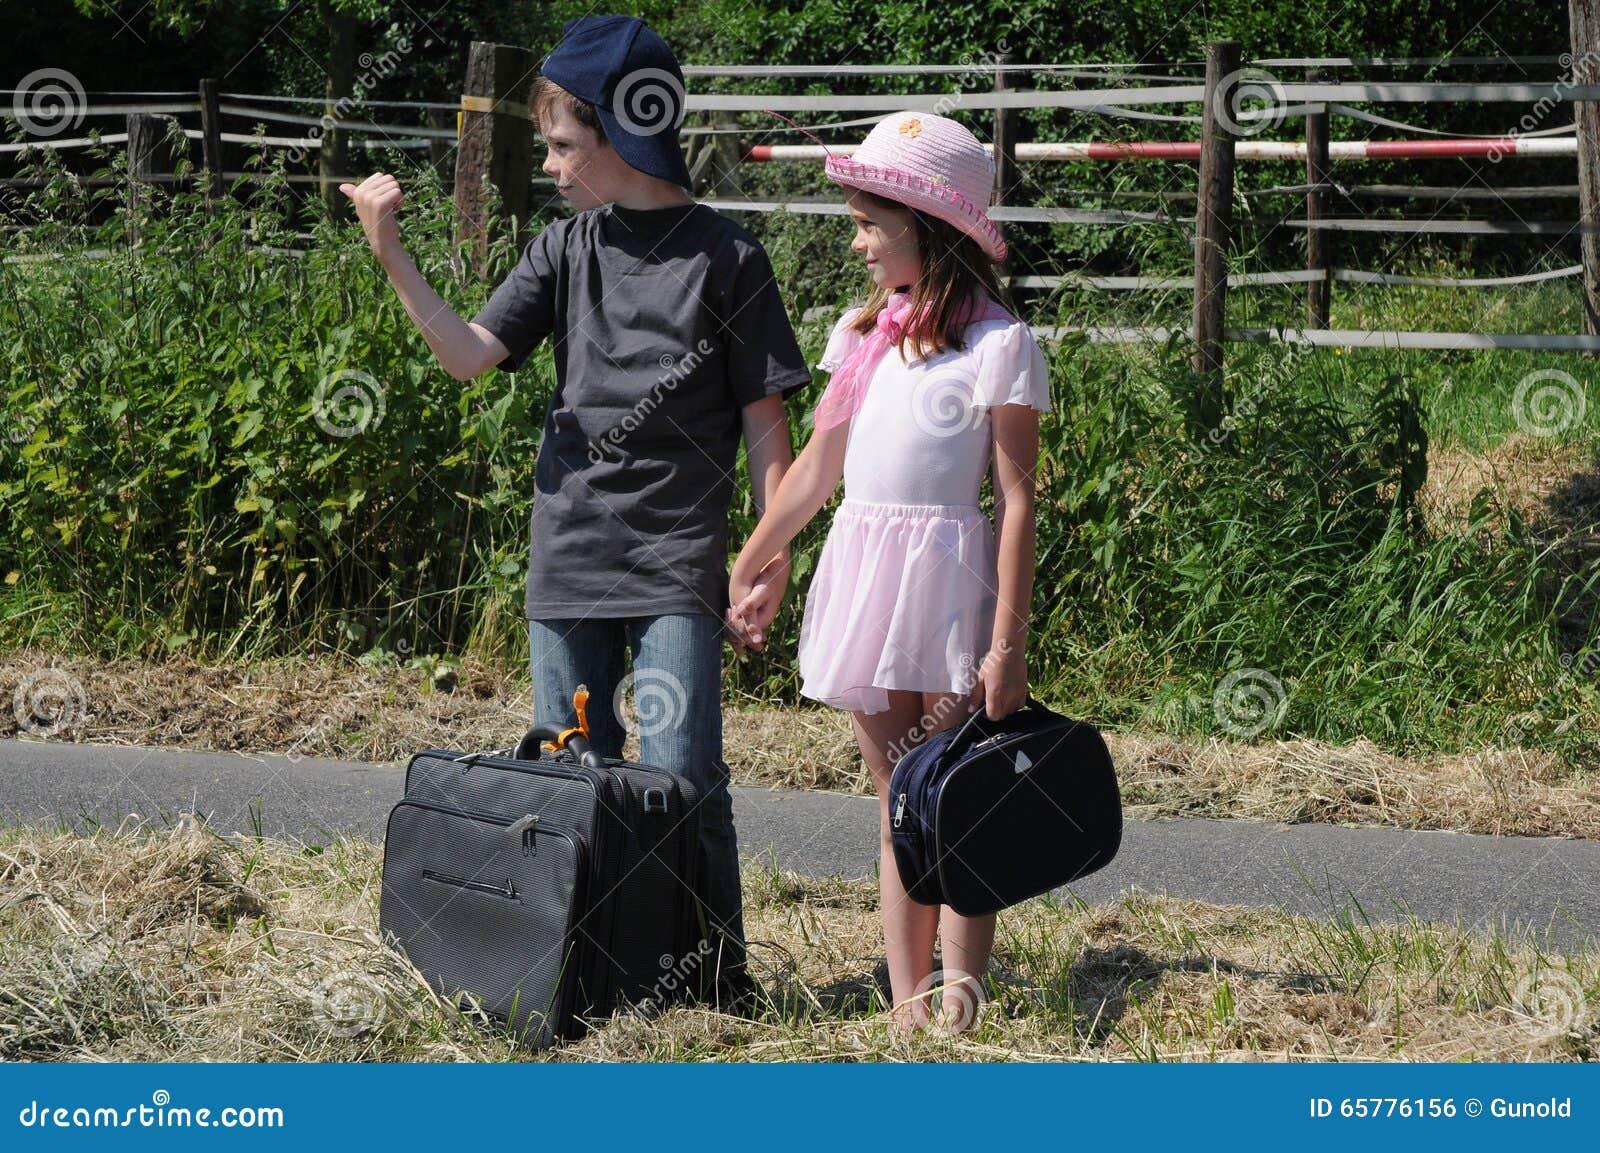 Siblings hitchhiking